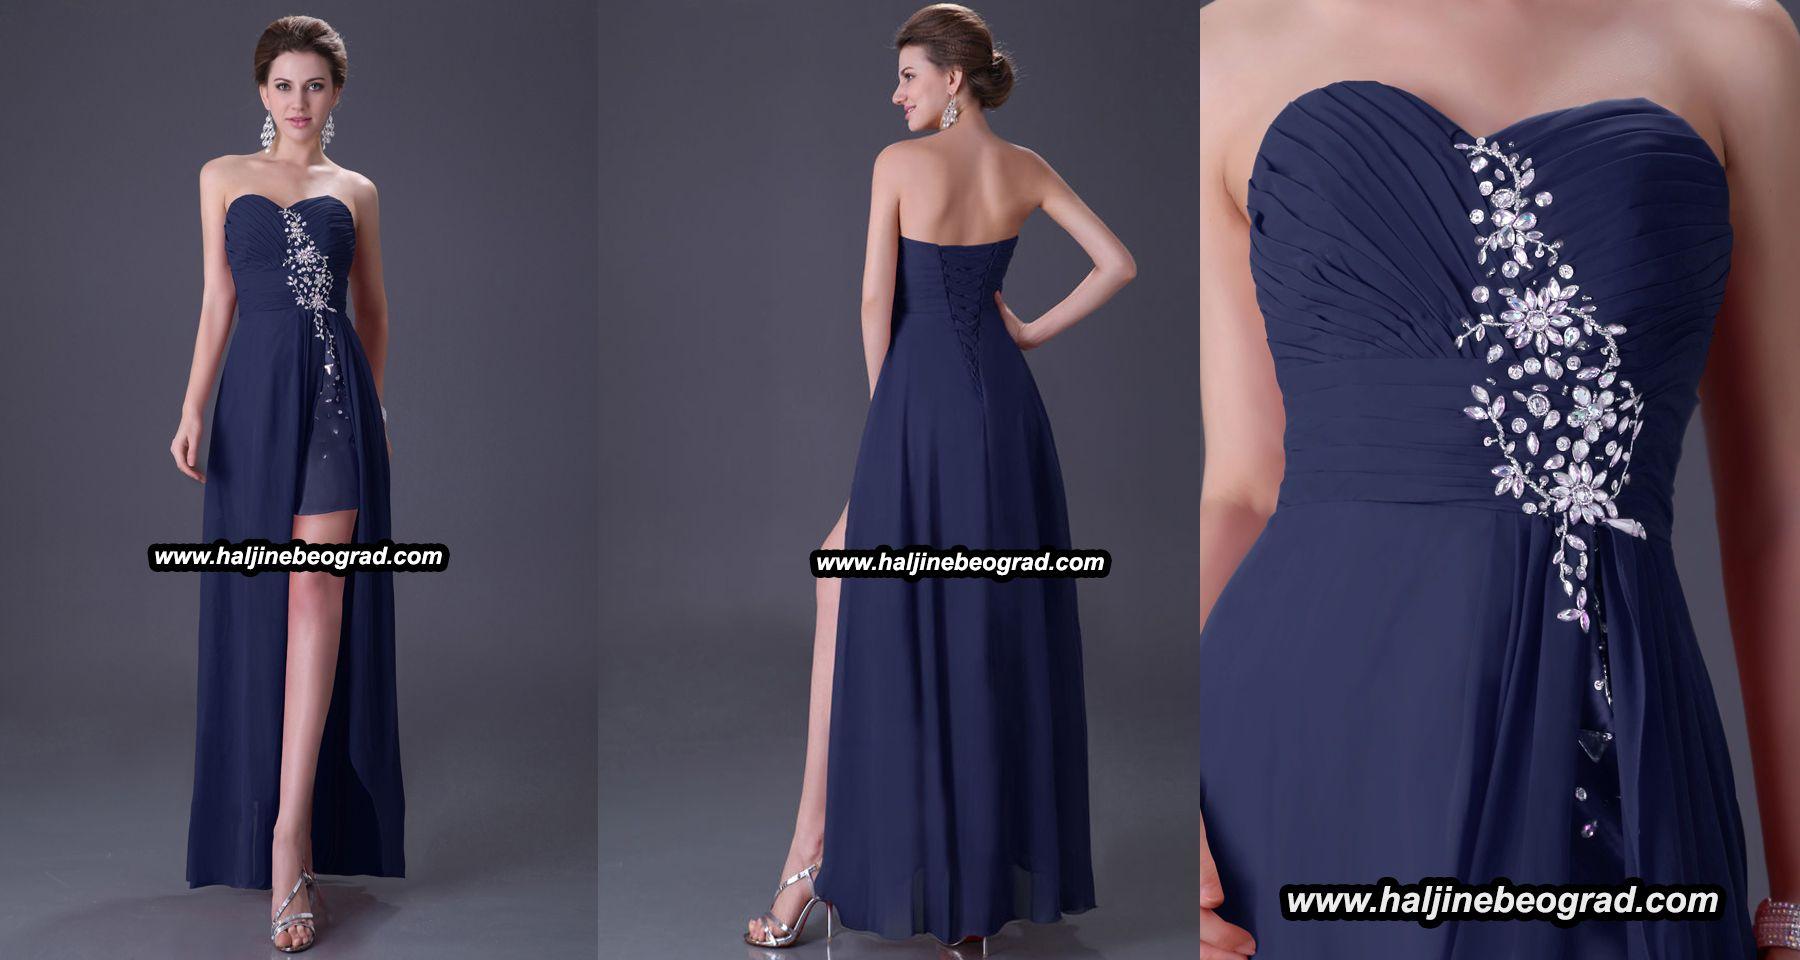 Duga Maturska Haljina In 2019 Formal Dresses Dresses Fashion